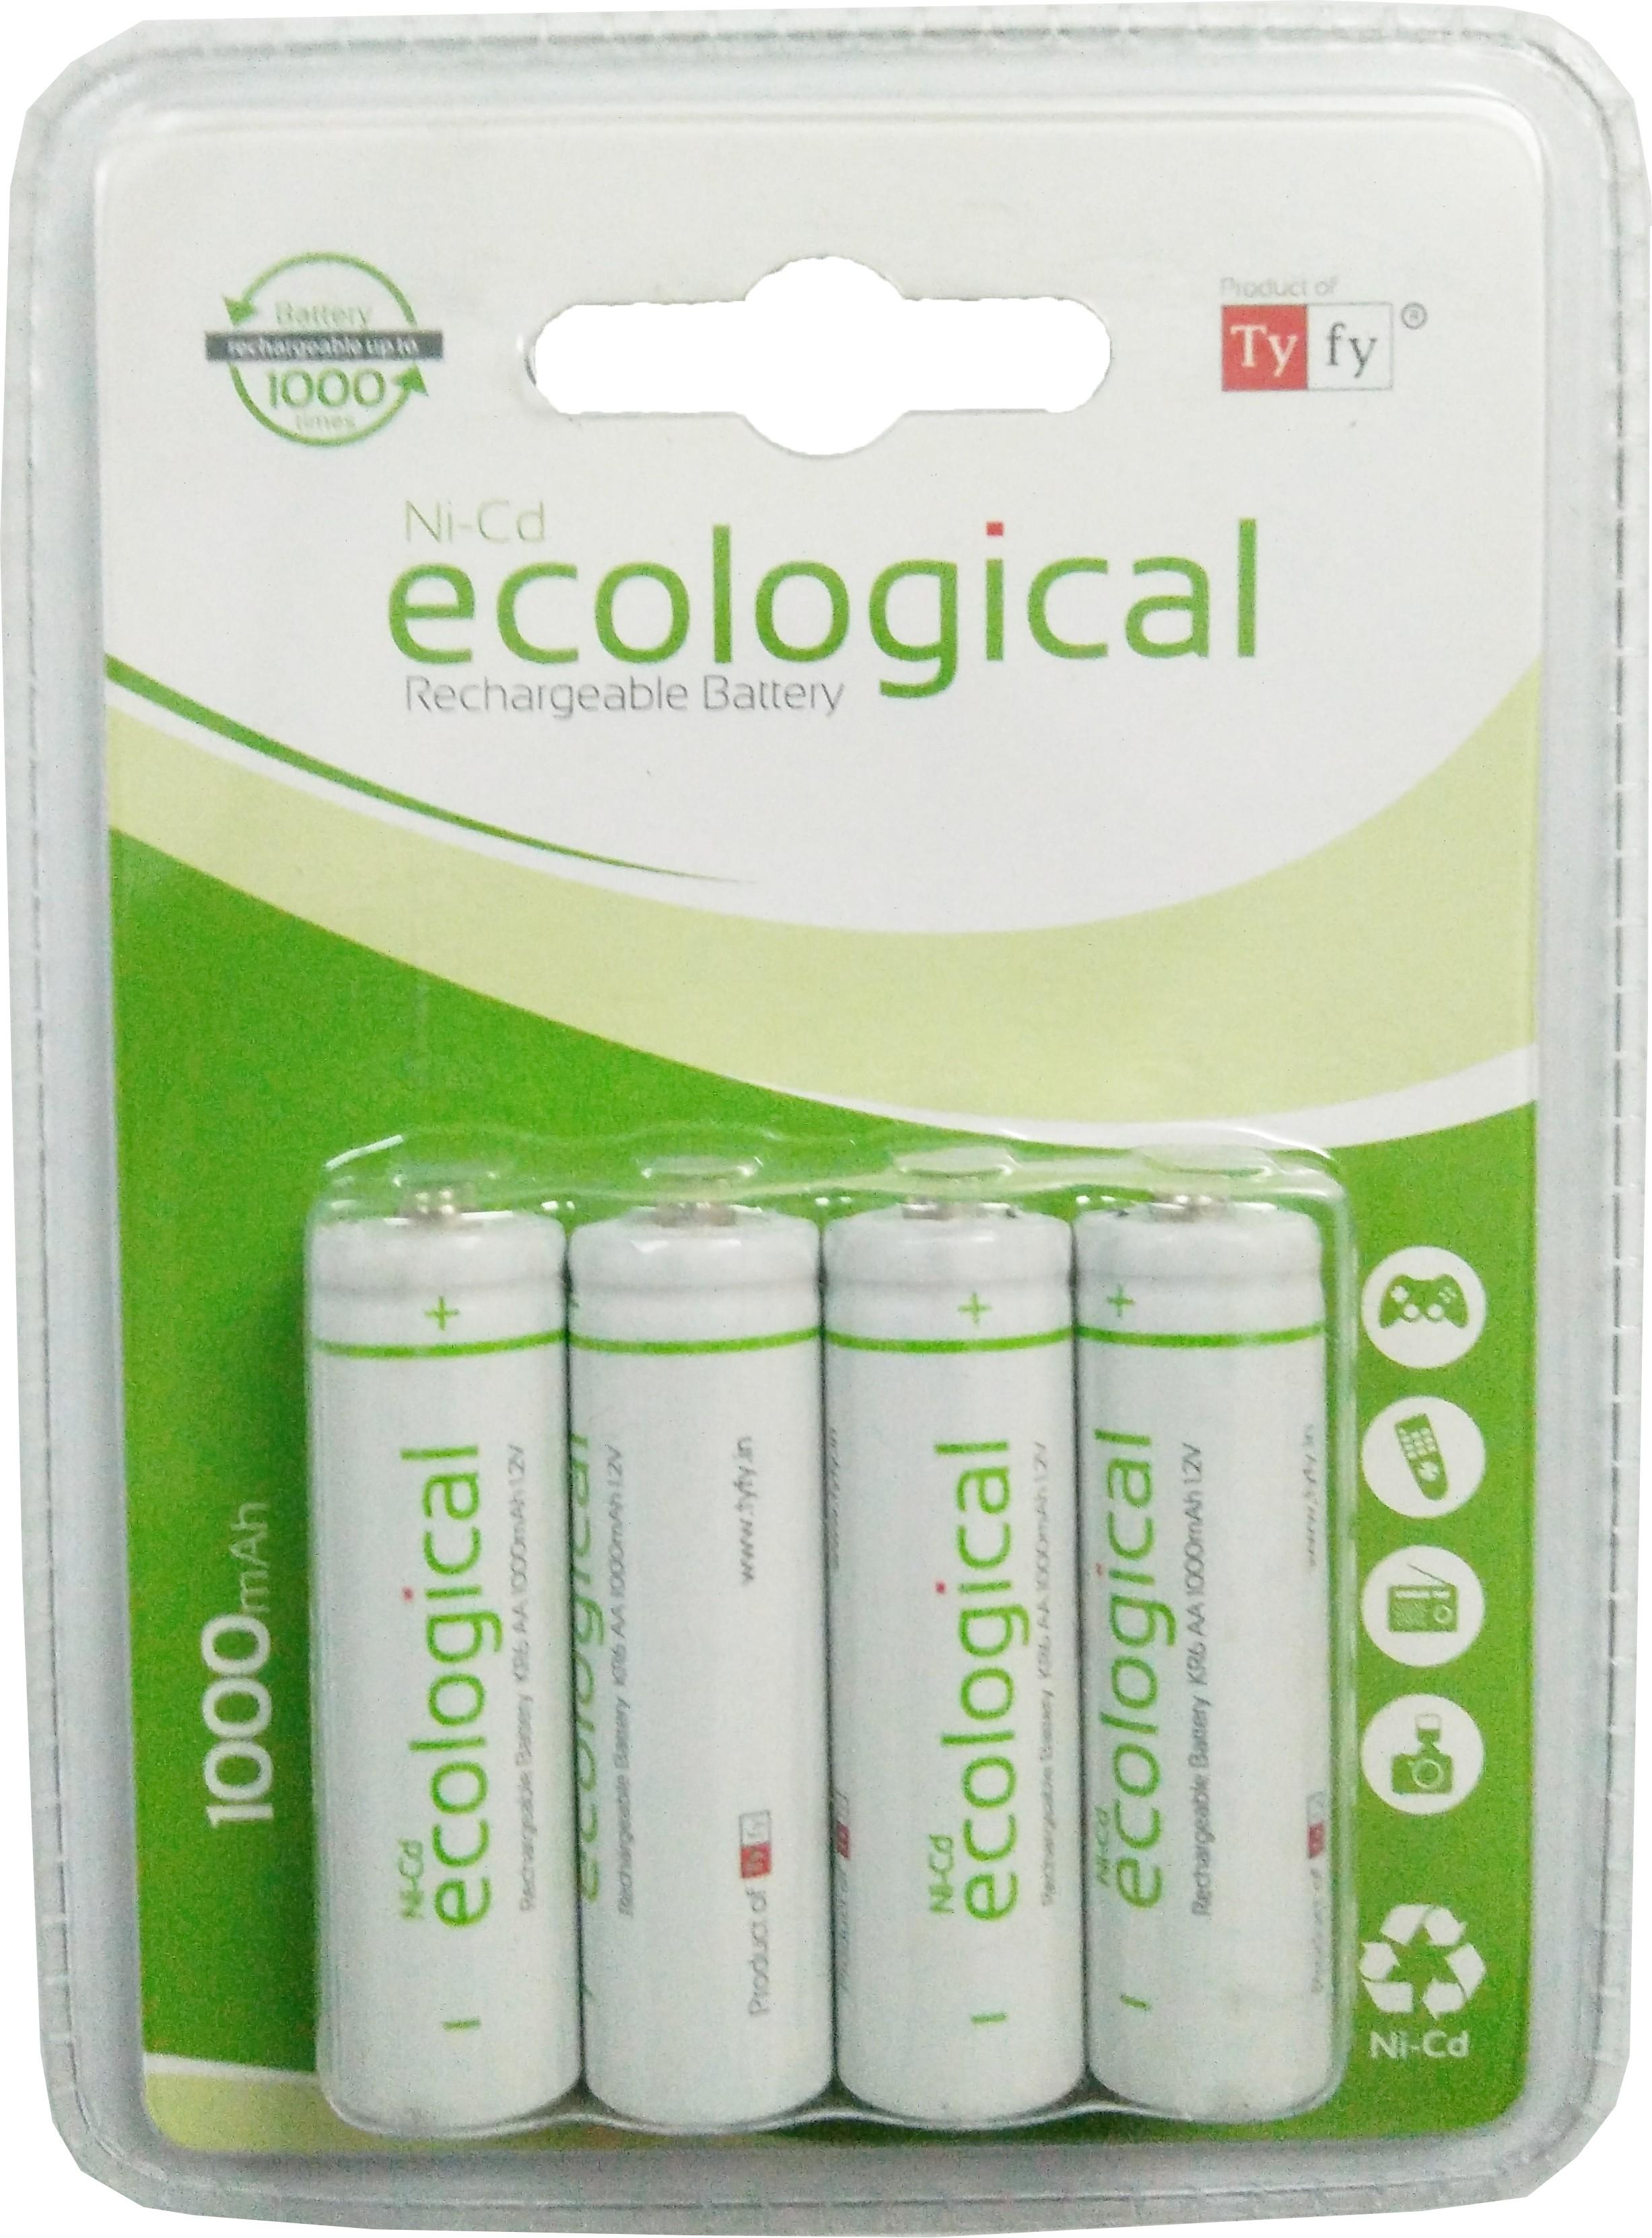 Batteries Sanyo Eneloop Battery Aa 2pcs Tyfy 1000 Bp4 X 2 Packs Rechargeable Ni Cd